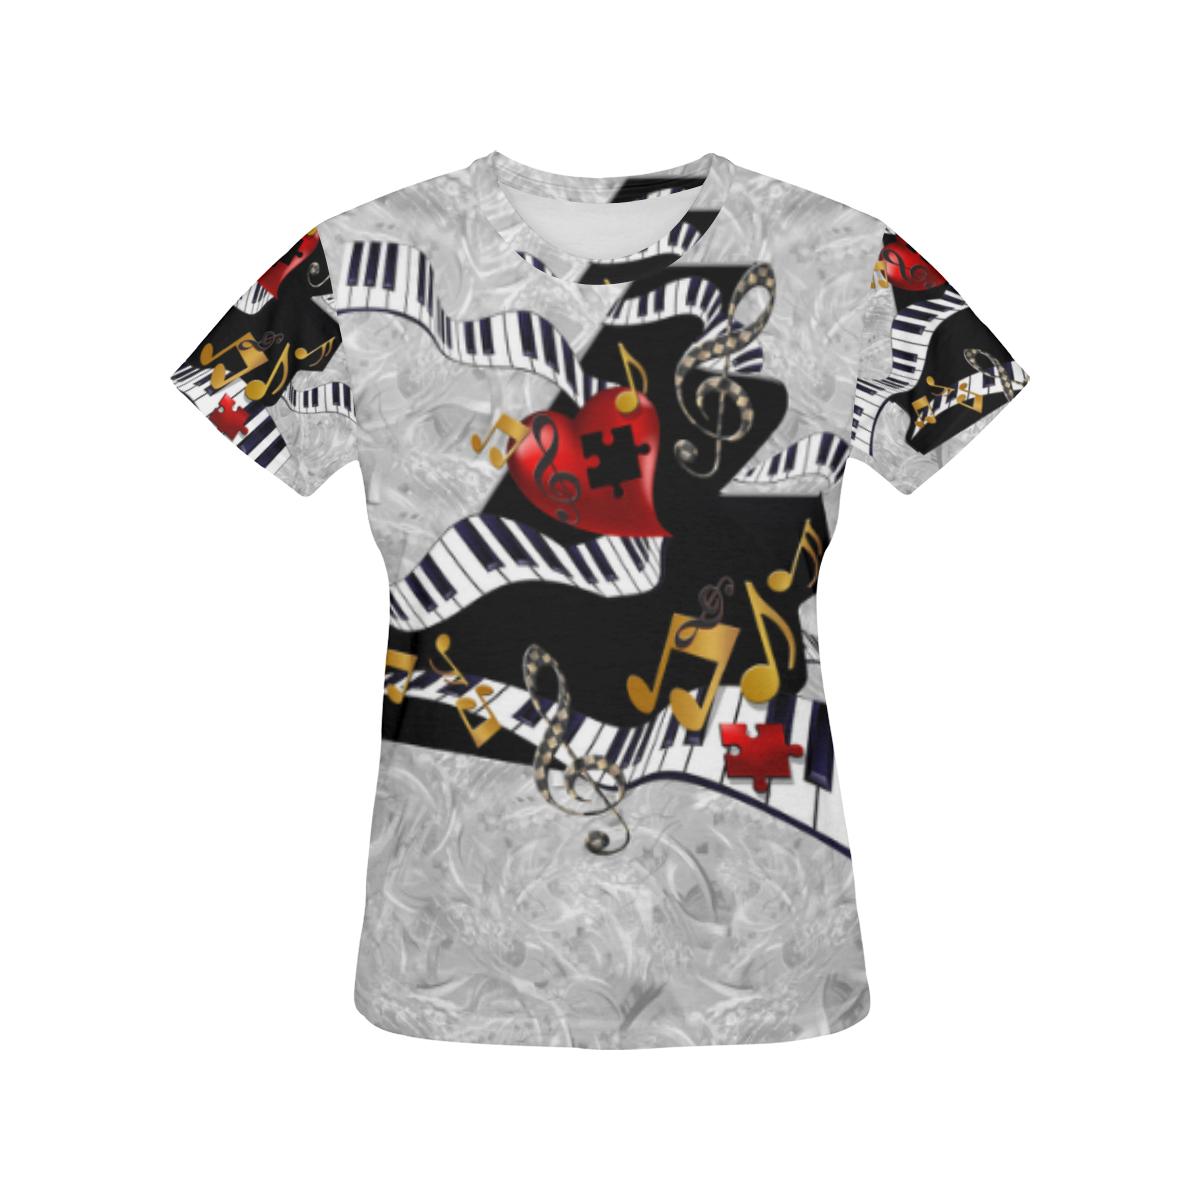 6f764856 Cool Prints On T Shirts - DREAMWORKS